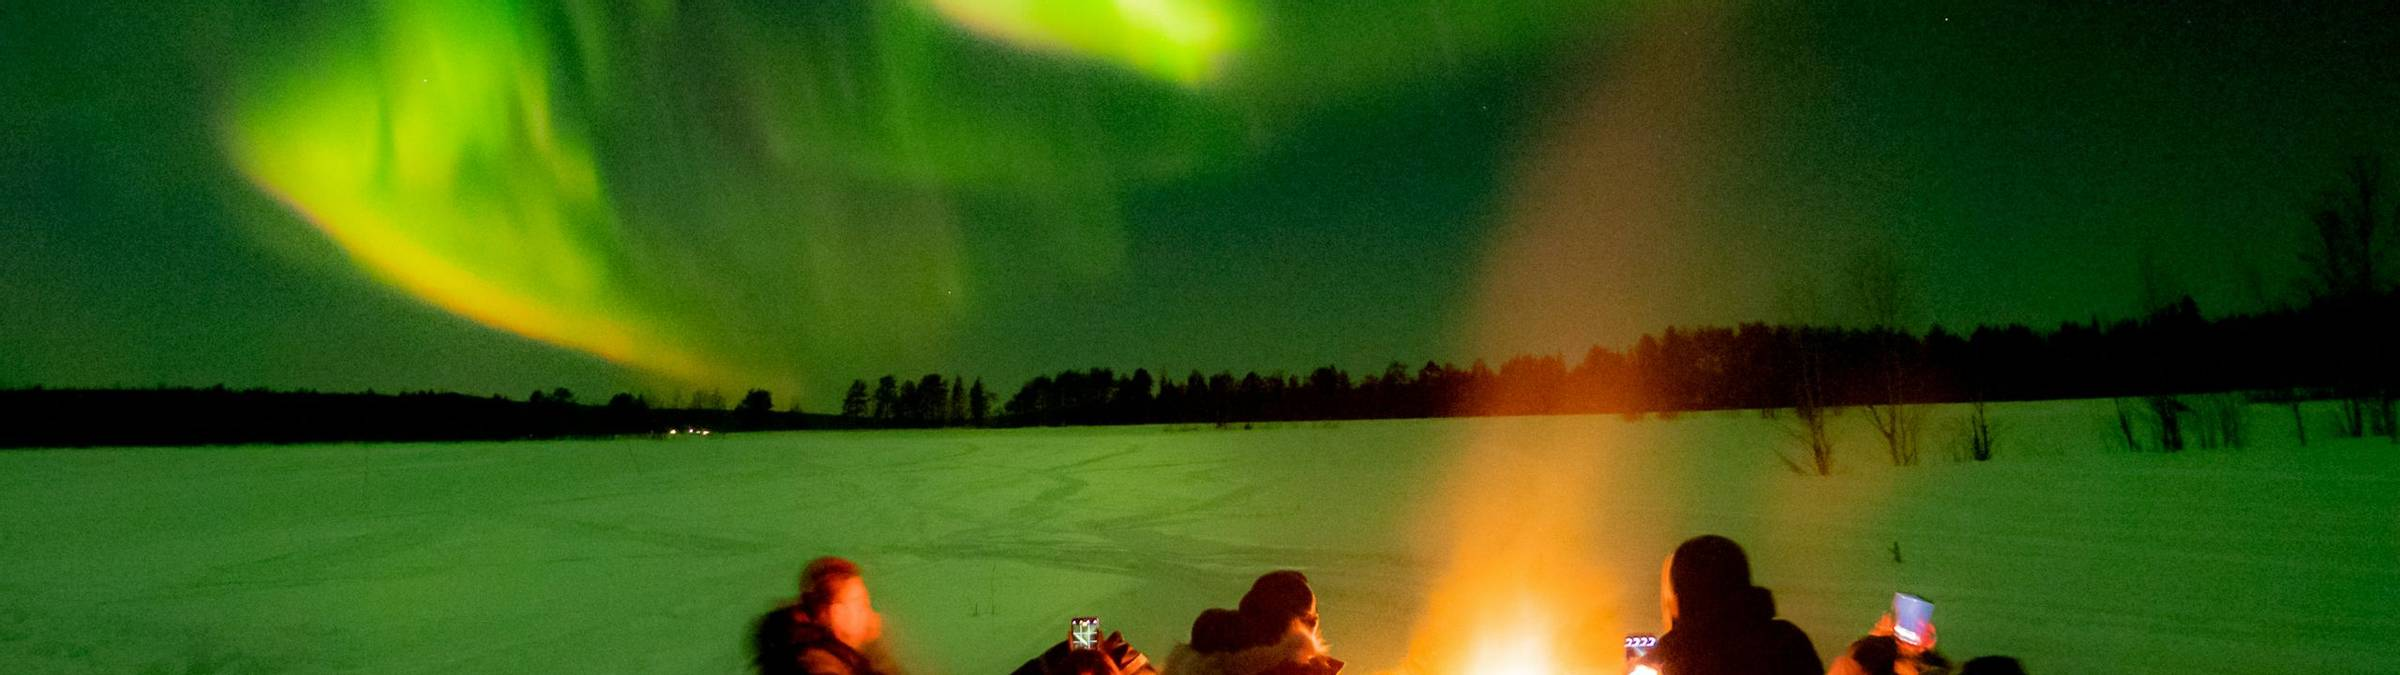 Credit Arctic Circle Wilderness Lodge (18)